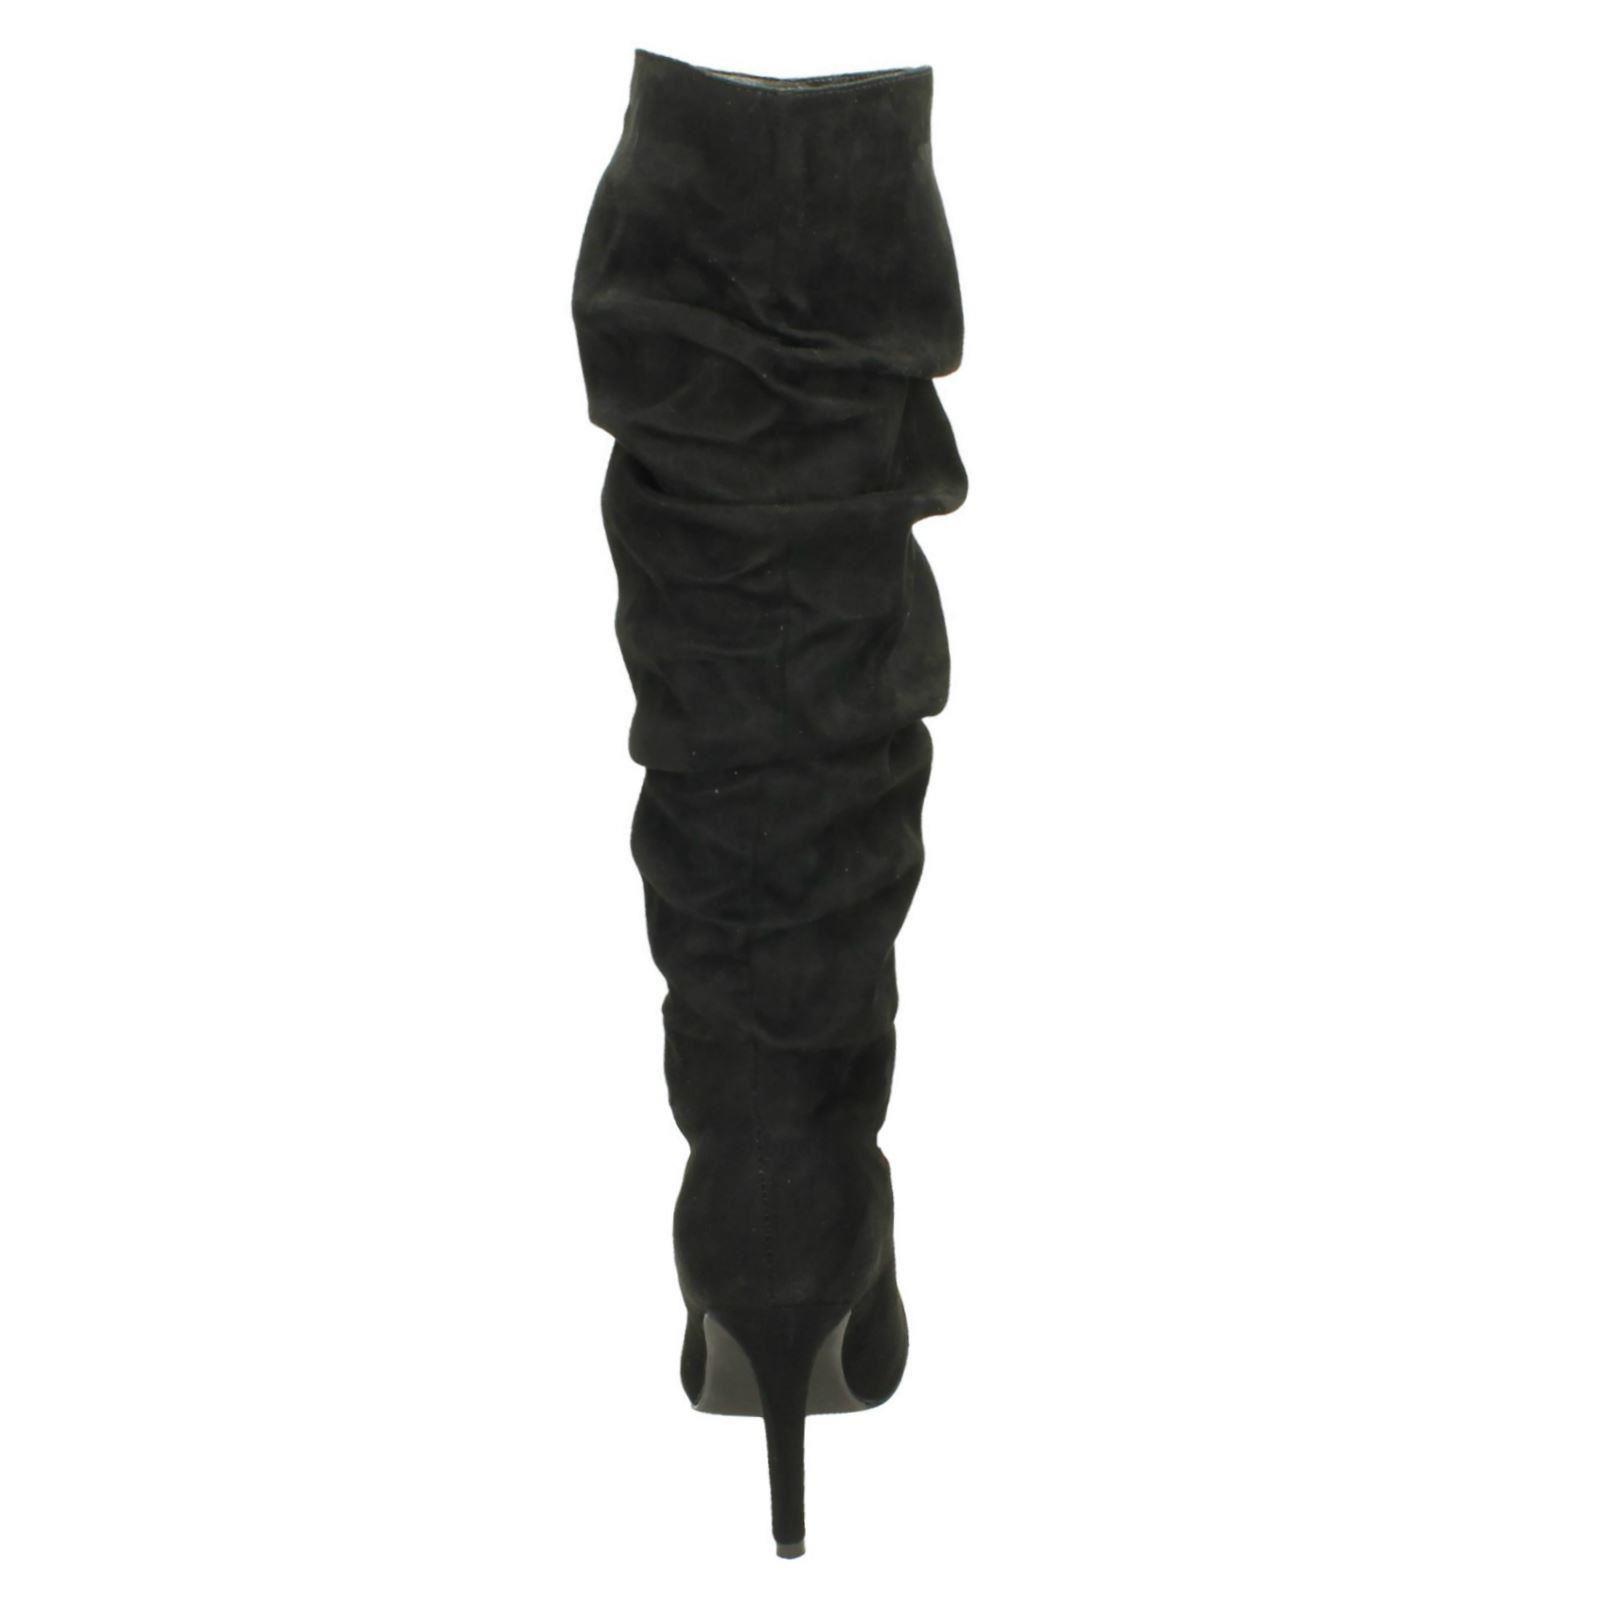 Slouch 'spot Boots Leg Knee Black On' High Ladies pwqZCxx